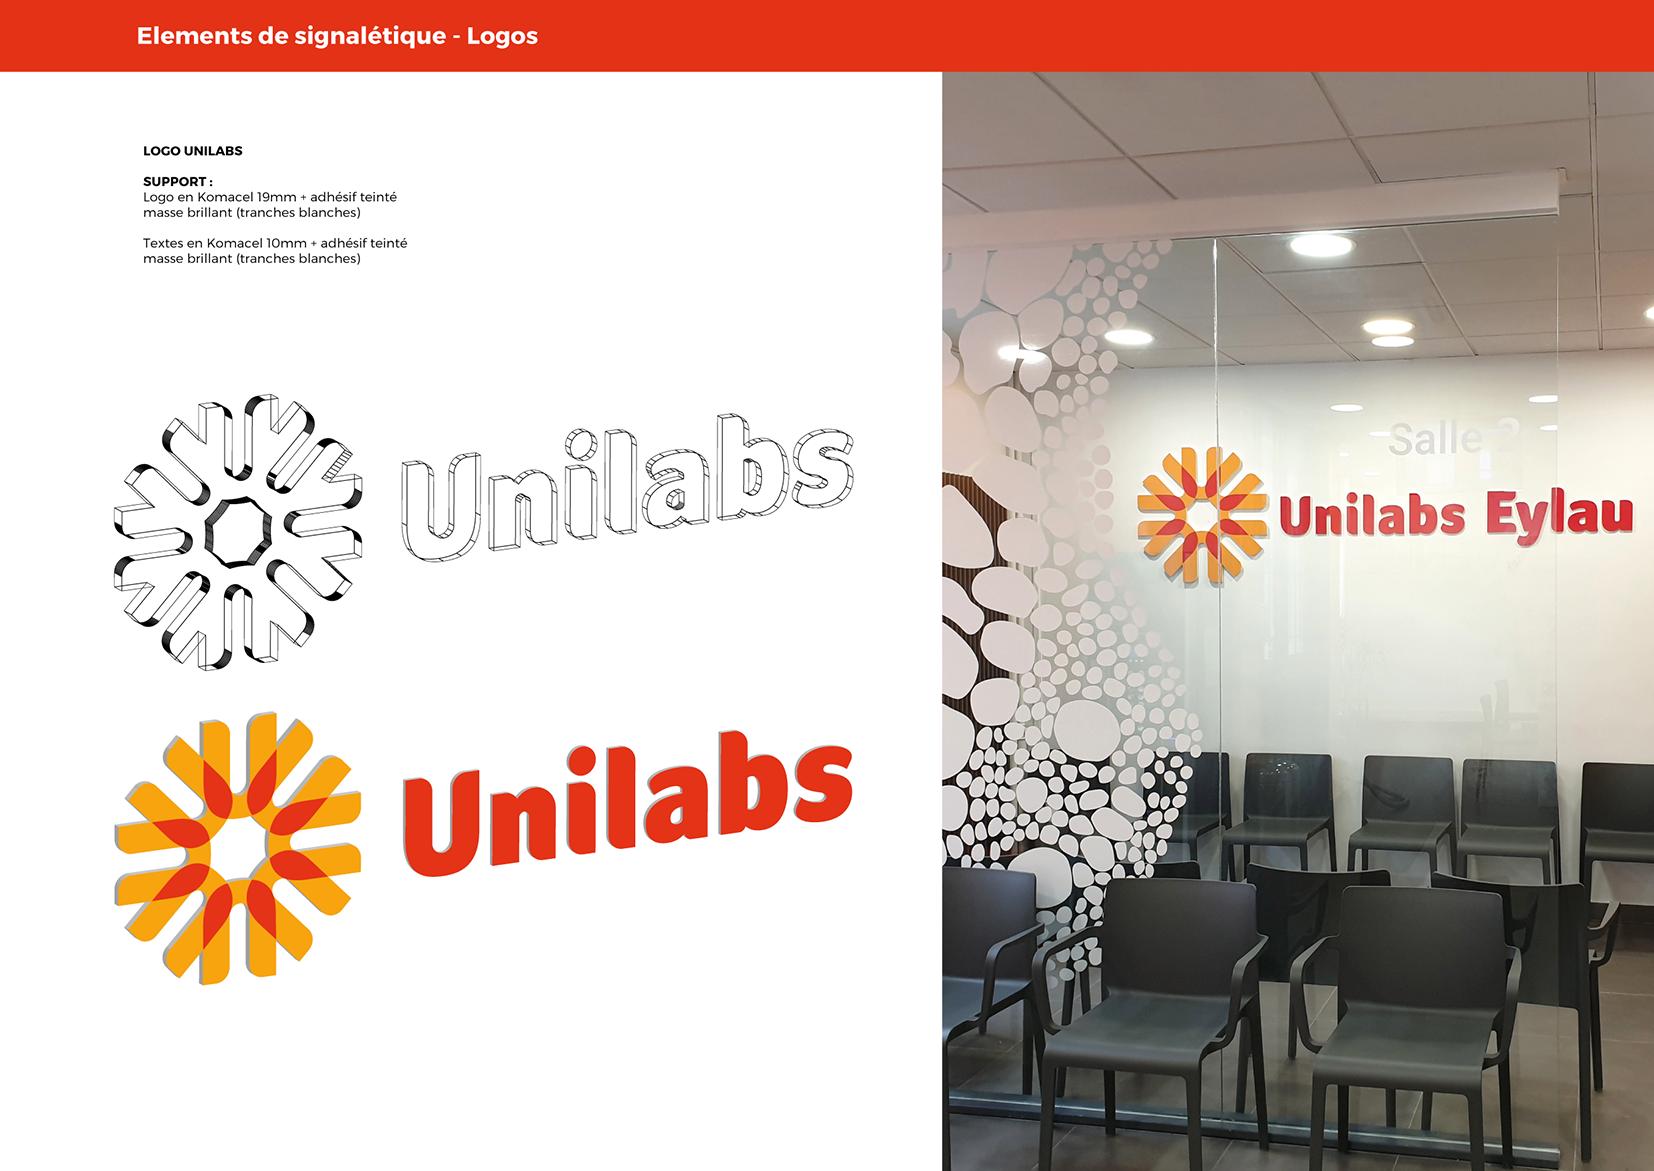 unilabs_Plan de travail 1 copie 2